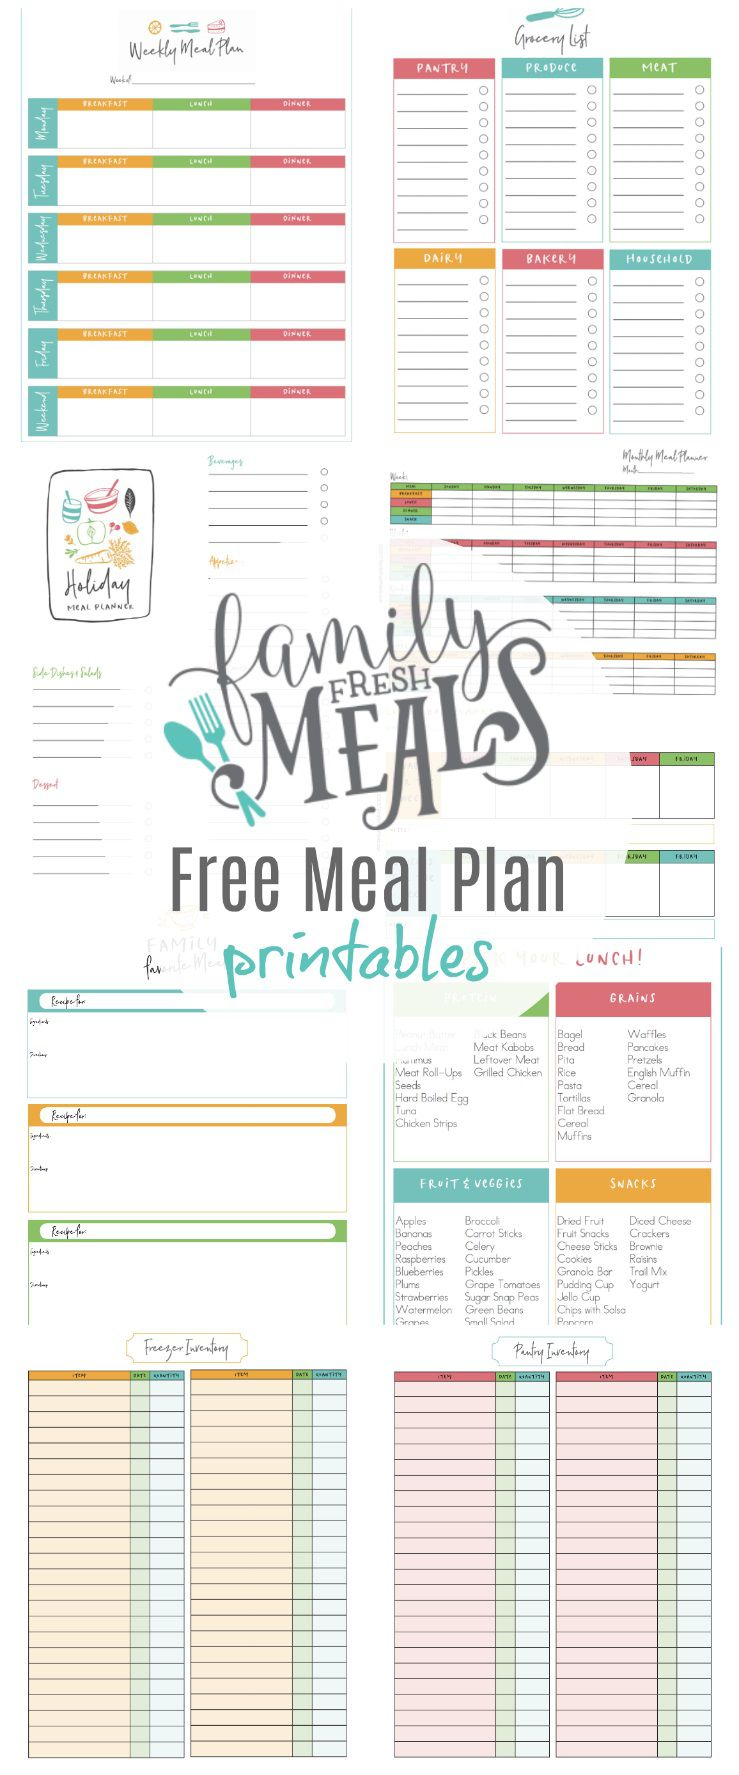 003 Unbelievable Meal Plan Printable Pdf Photo  Worksheet Downloadable Template SheetFull